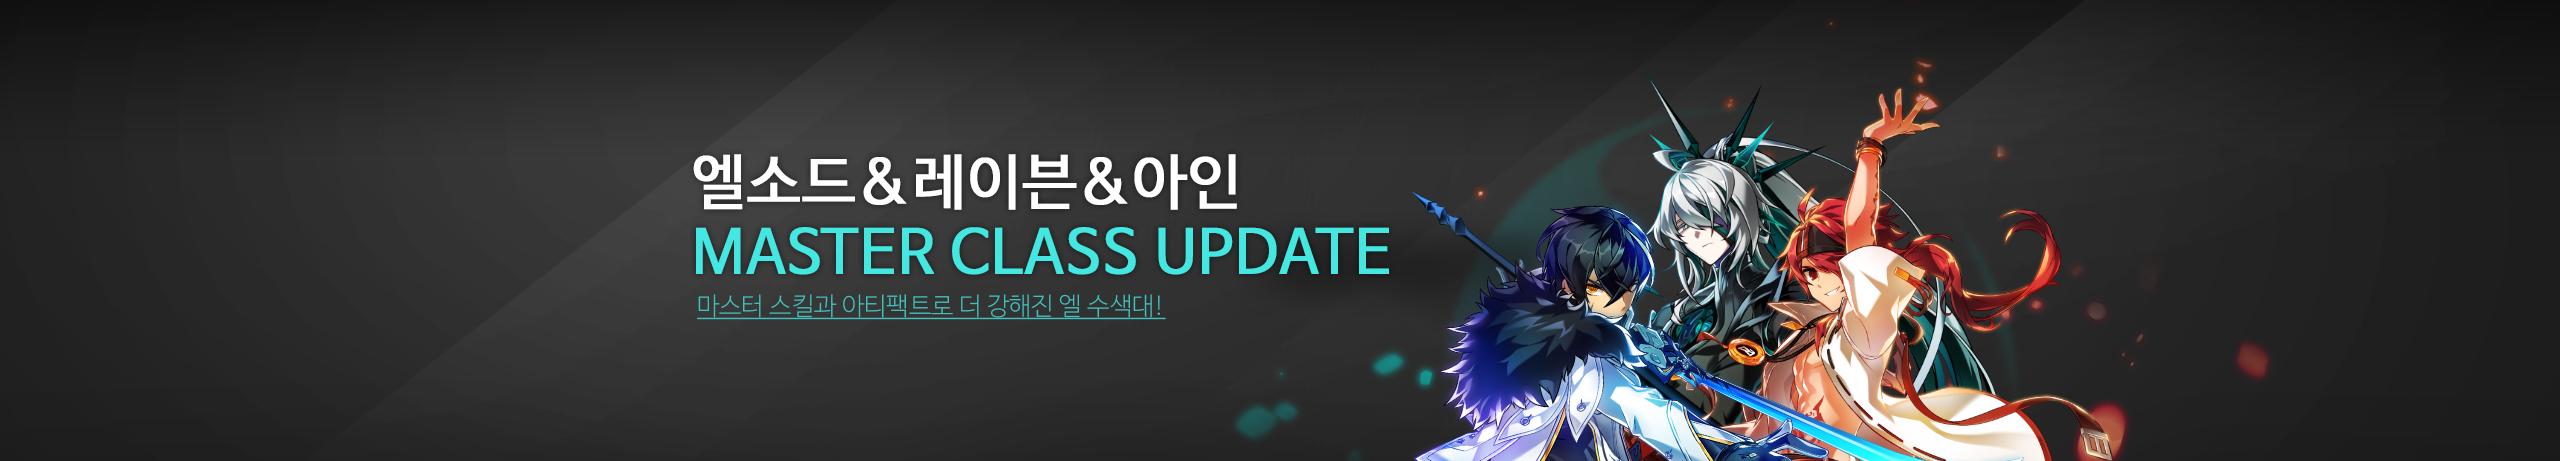 MASTER CLASS UPDATE - 6차